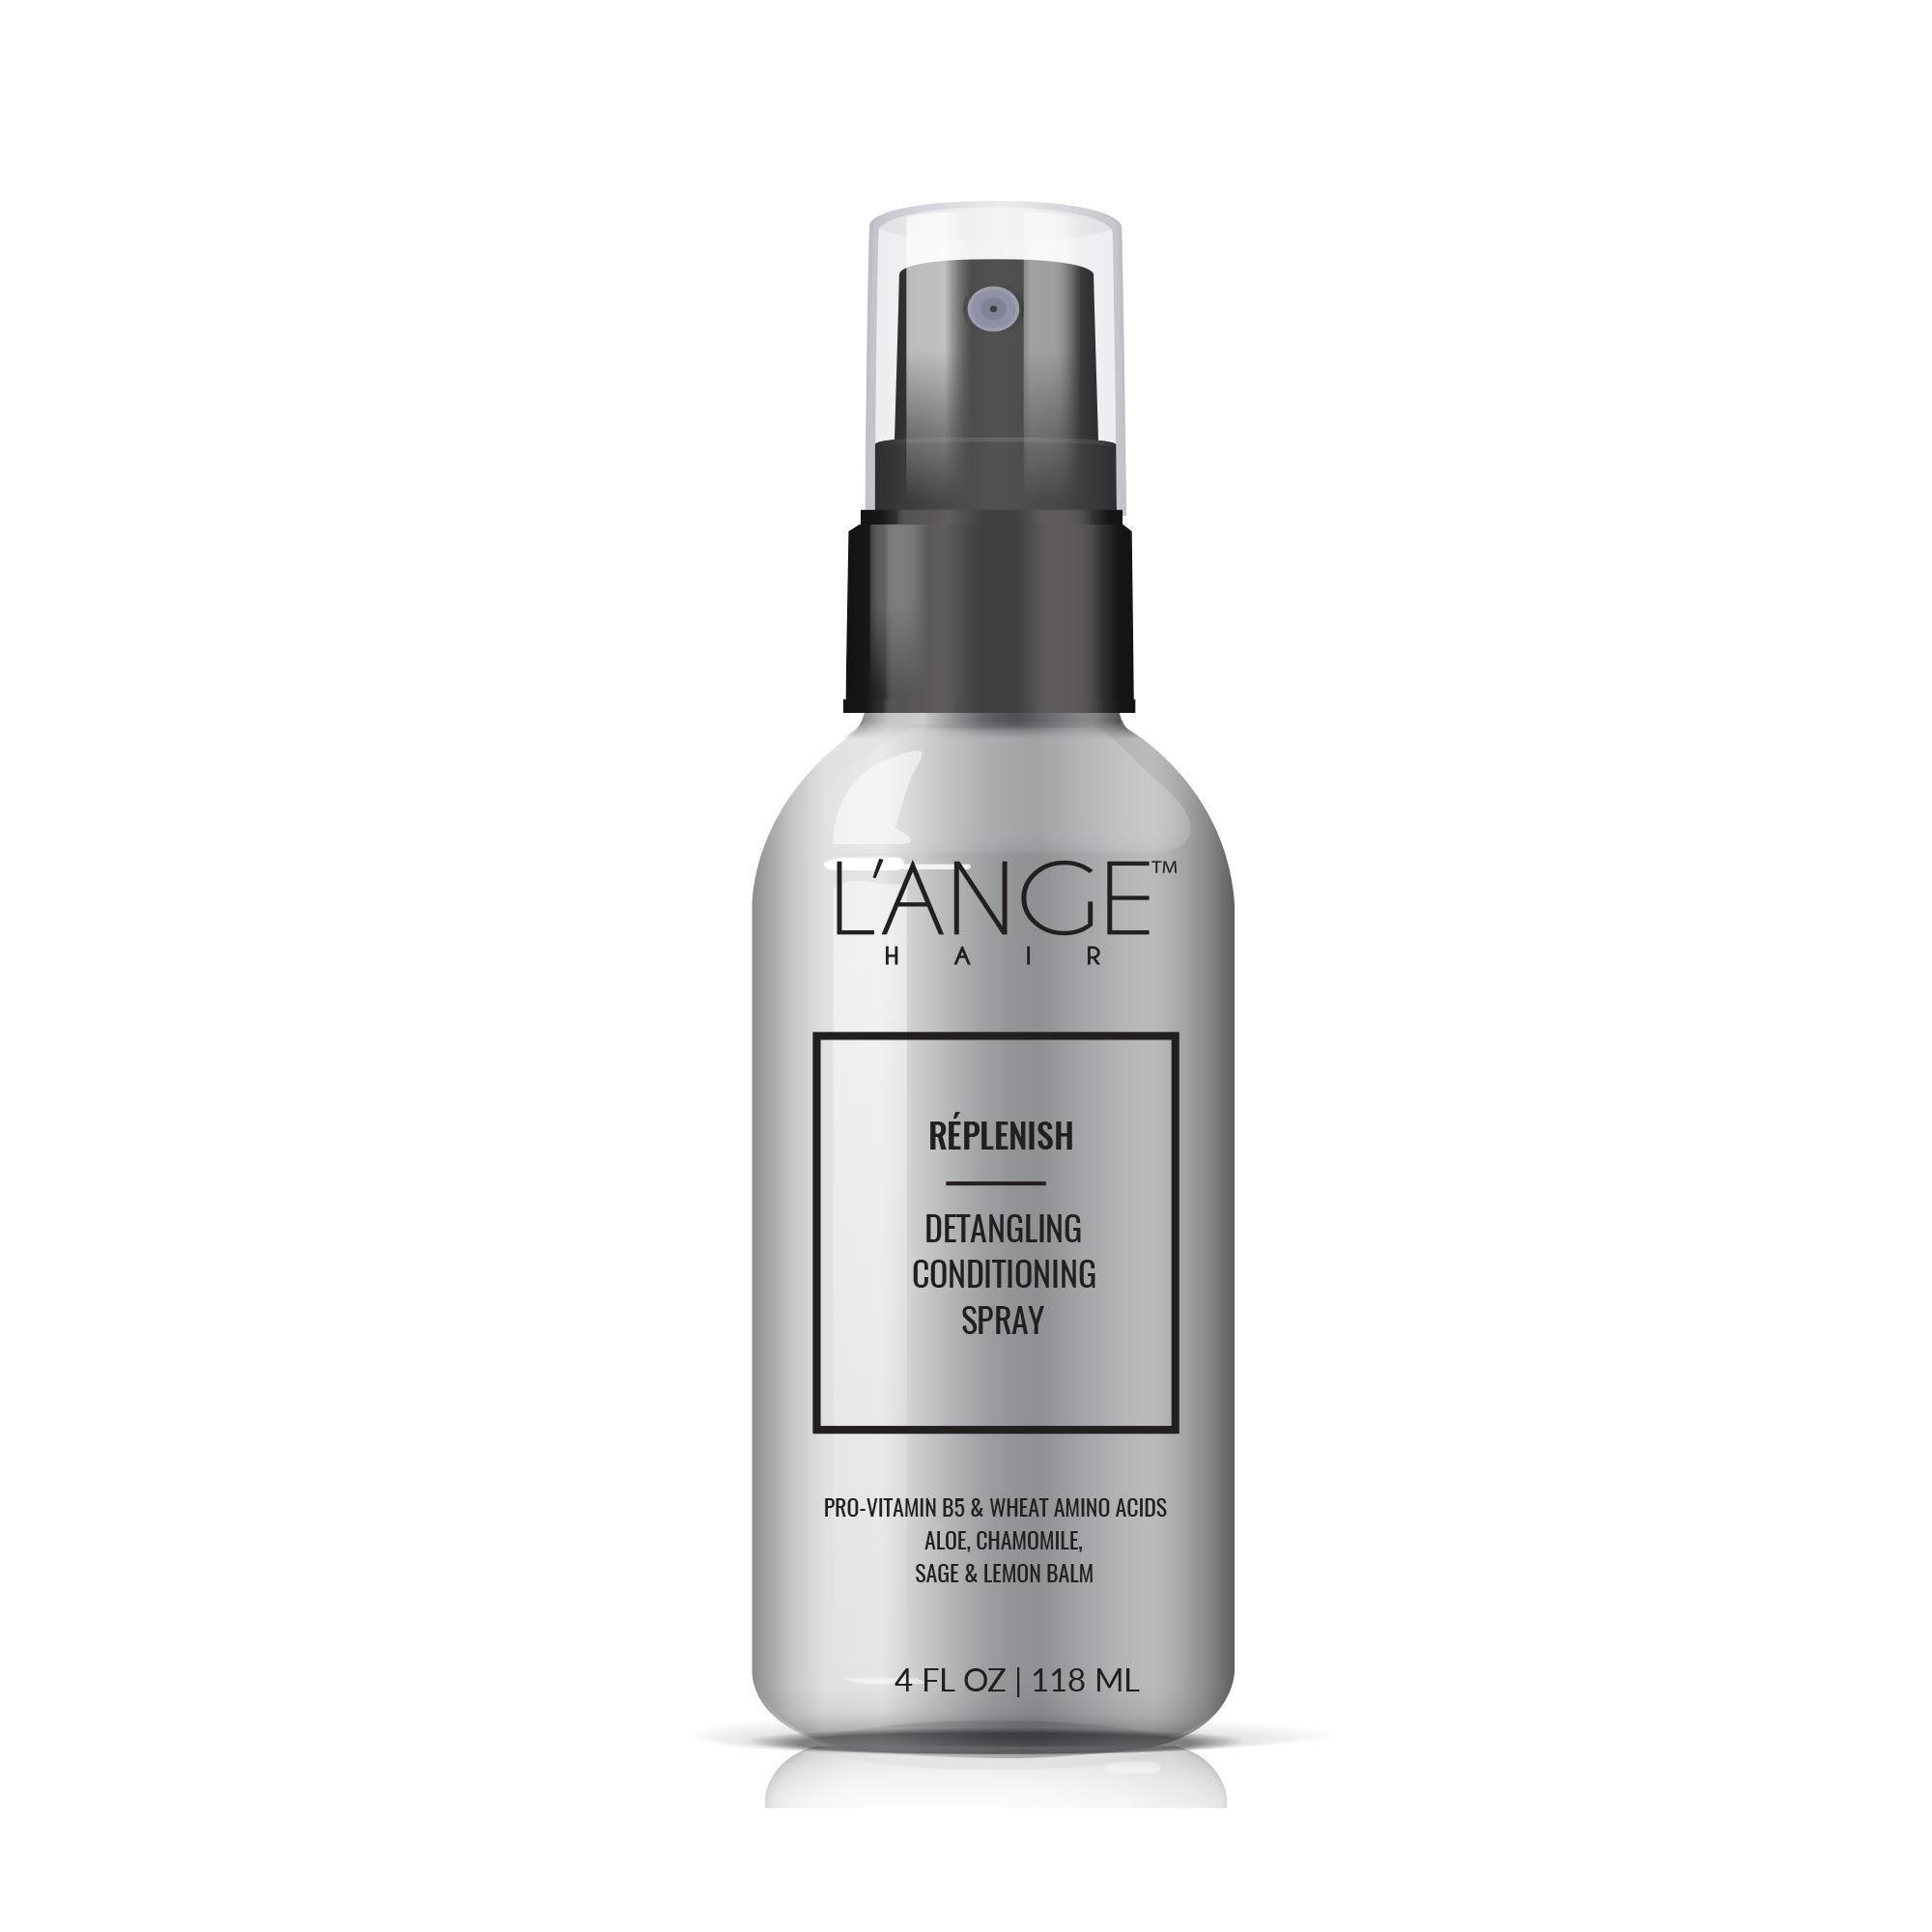 L'ANGE™ Réplenish Conditioning Spray